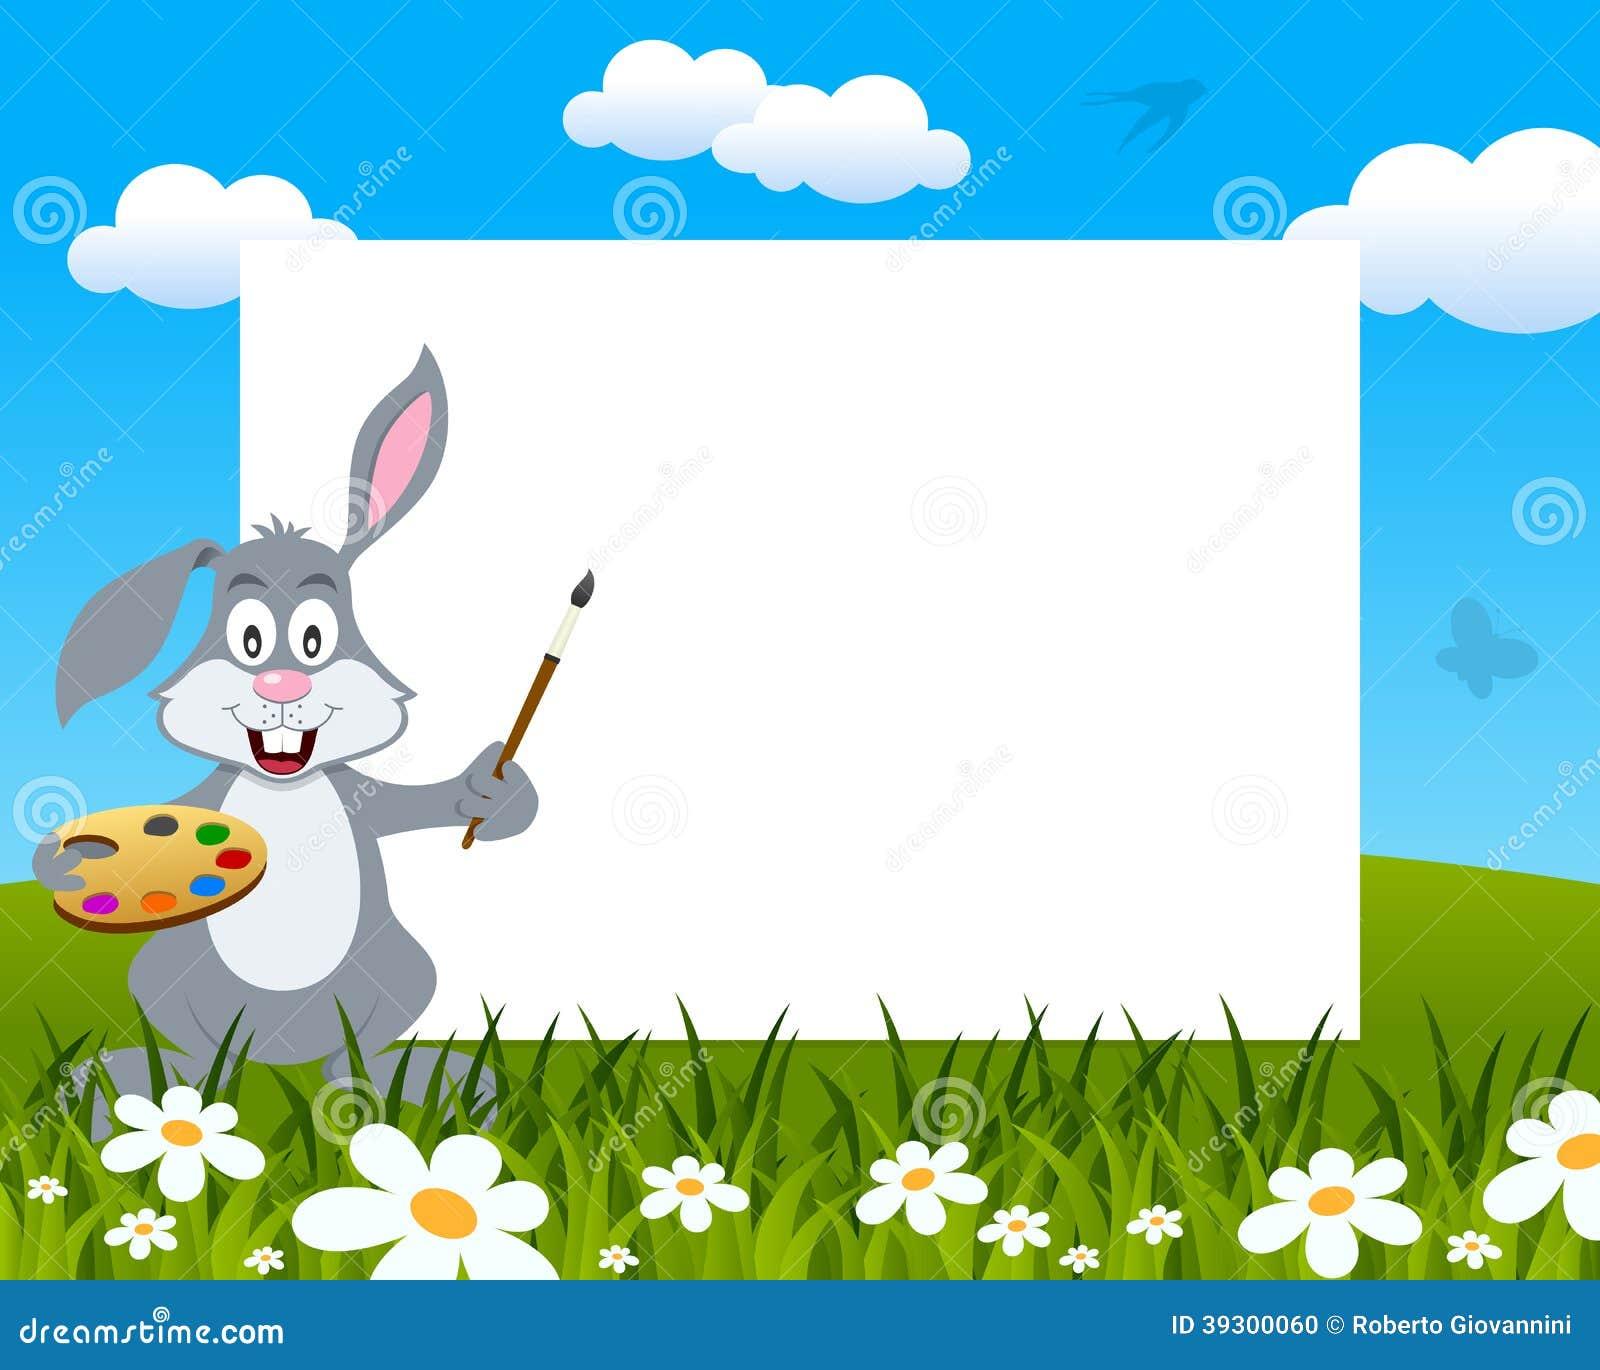 easter bunny rabbit photo frame illustration 39300060 megapixl - Easter Photo Frames